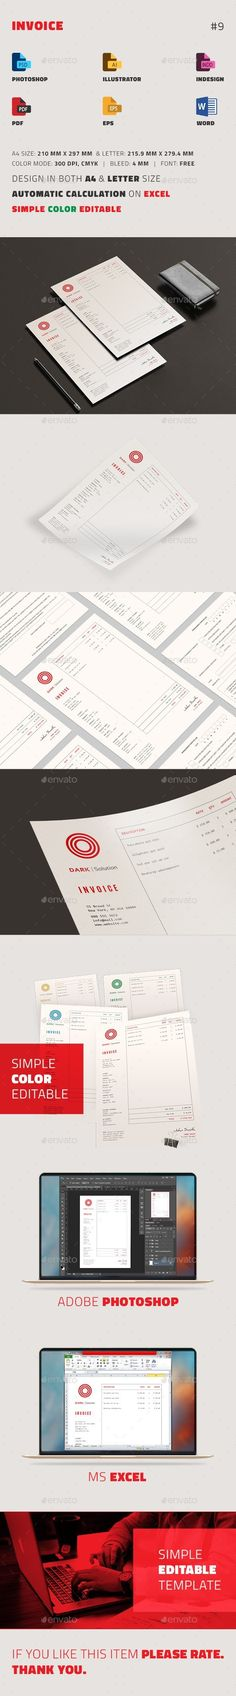 Business Proposal Stationery, Microsoft word 2007 and Words - microsoft word proposal templates